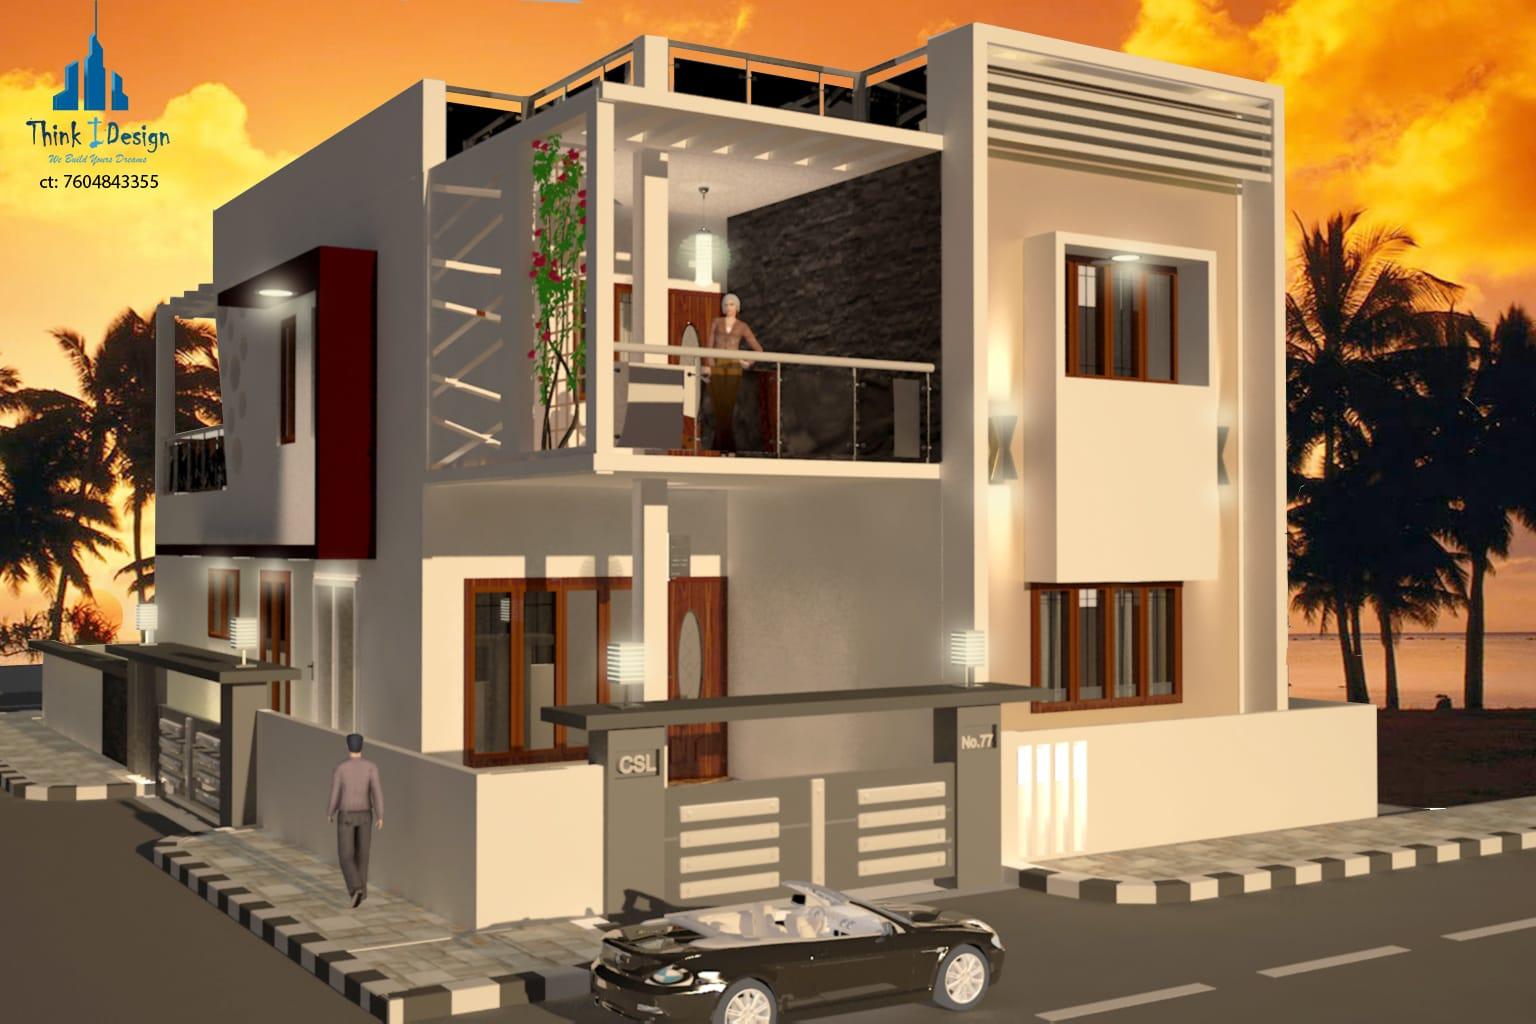 Portfolio for 2D Plans, 3D Interior & Exterior Designs